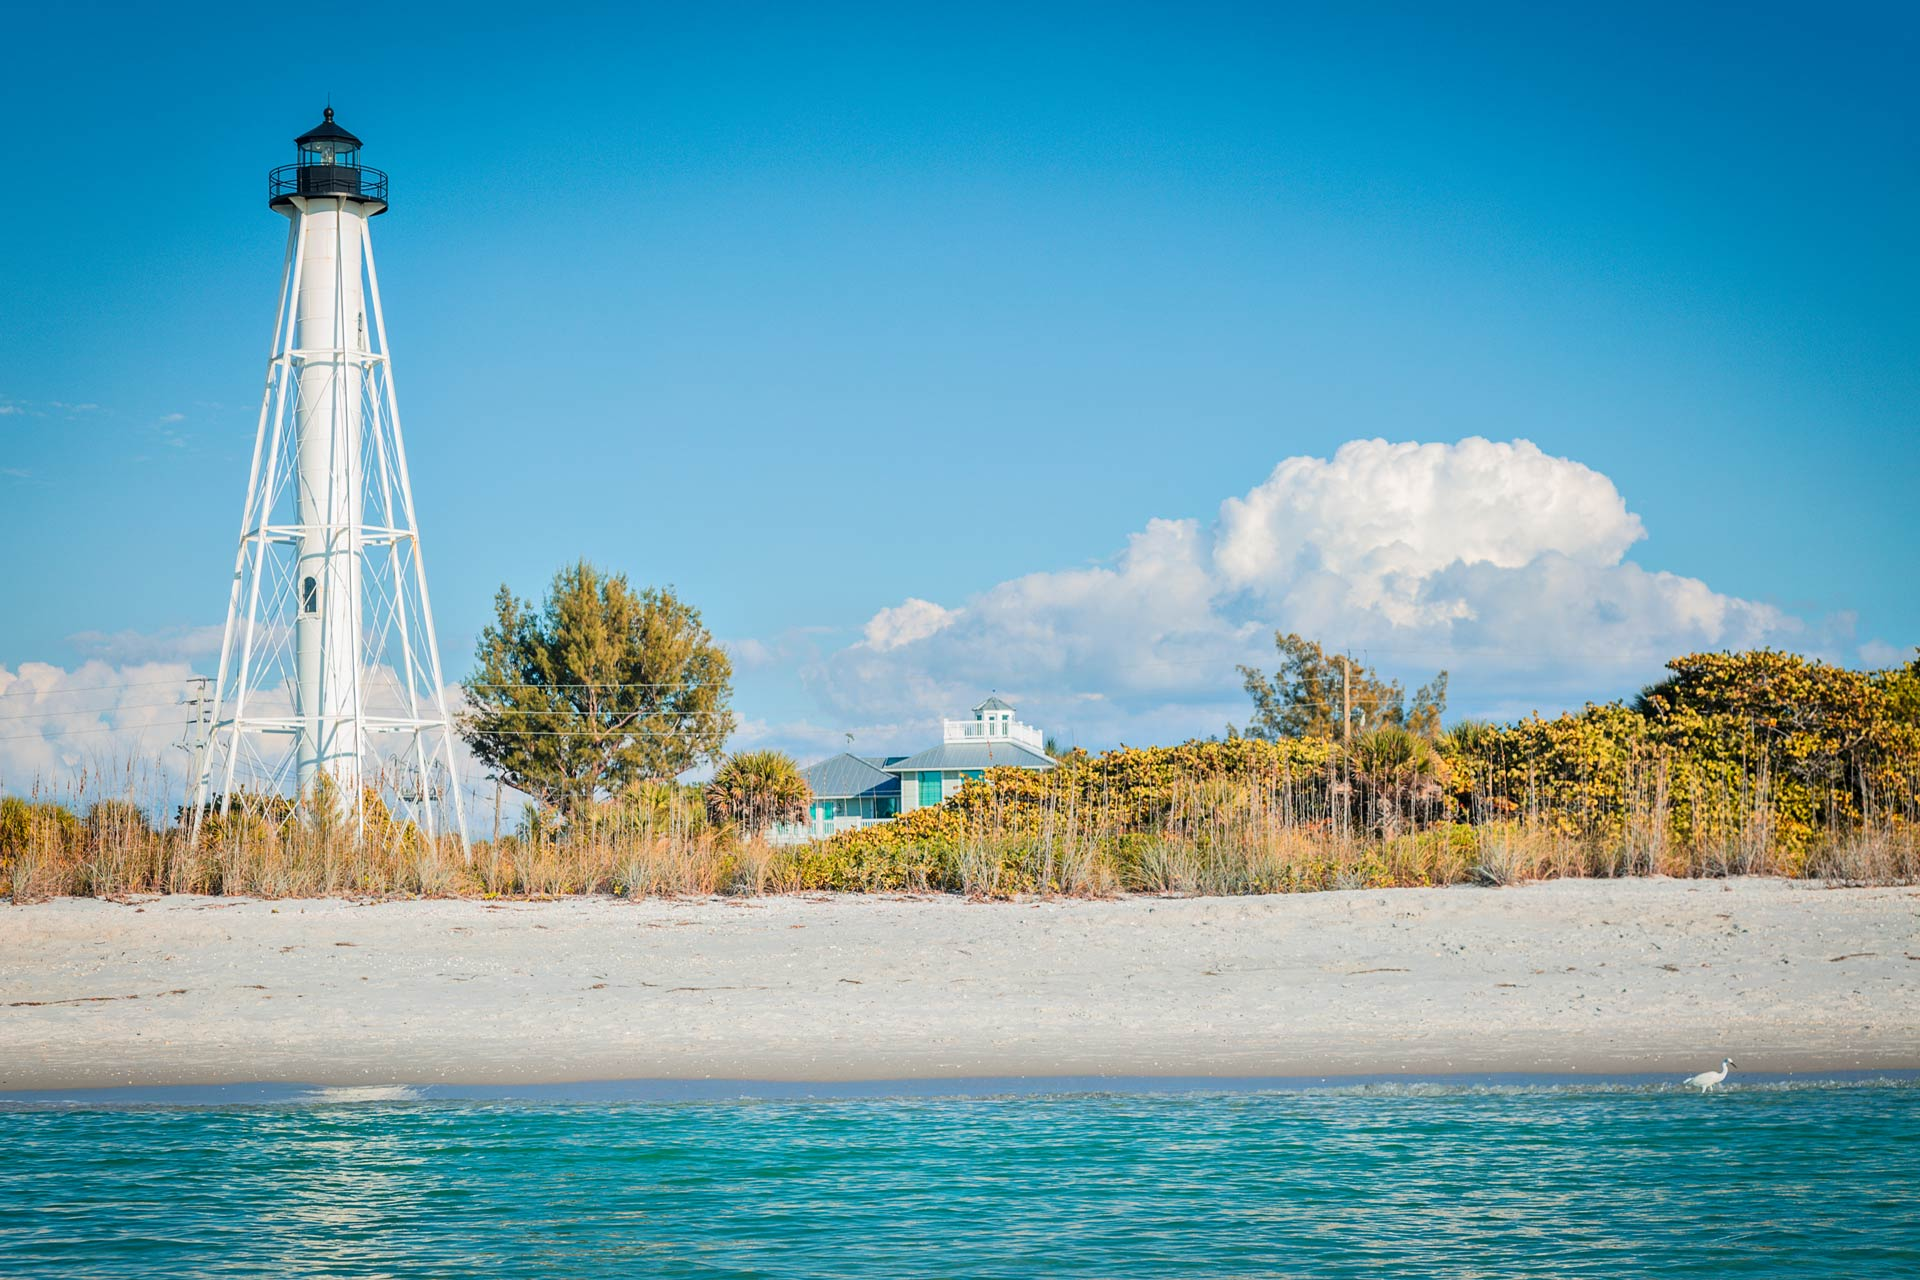 Gasparilla Island Lighthouse in Boca Grande, Florida